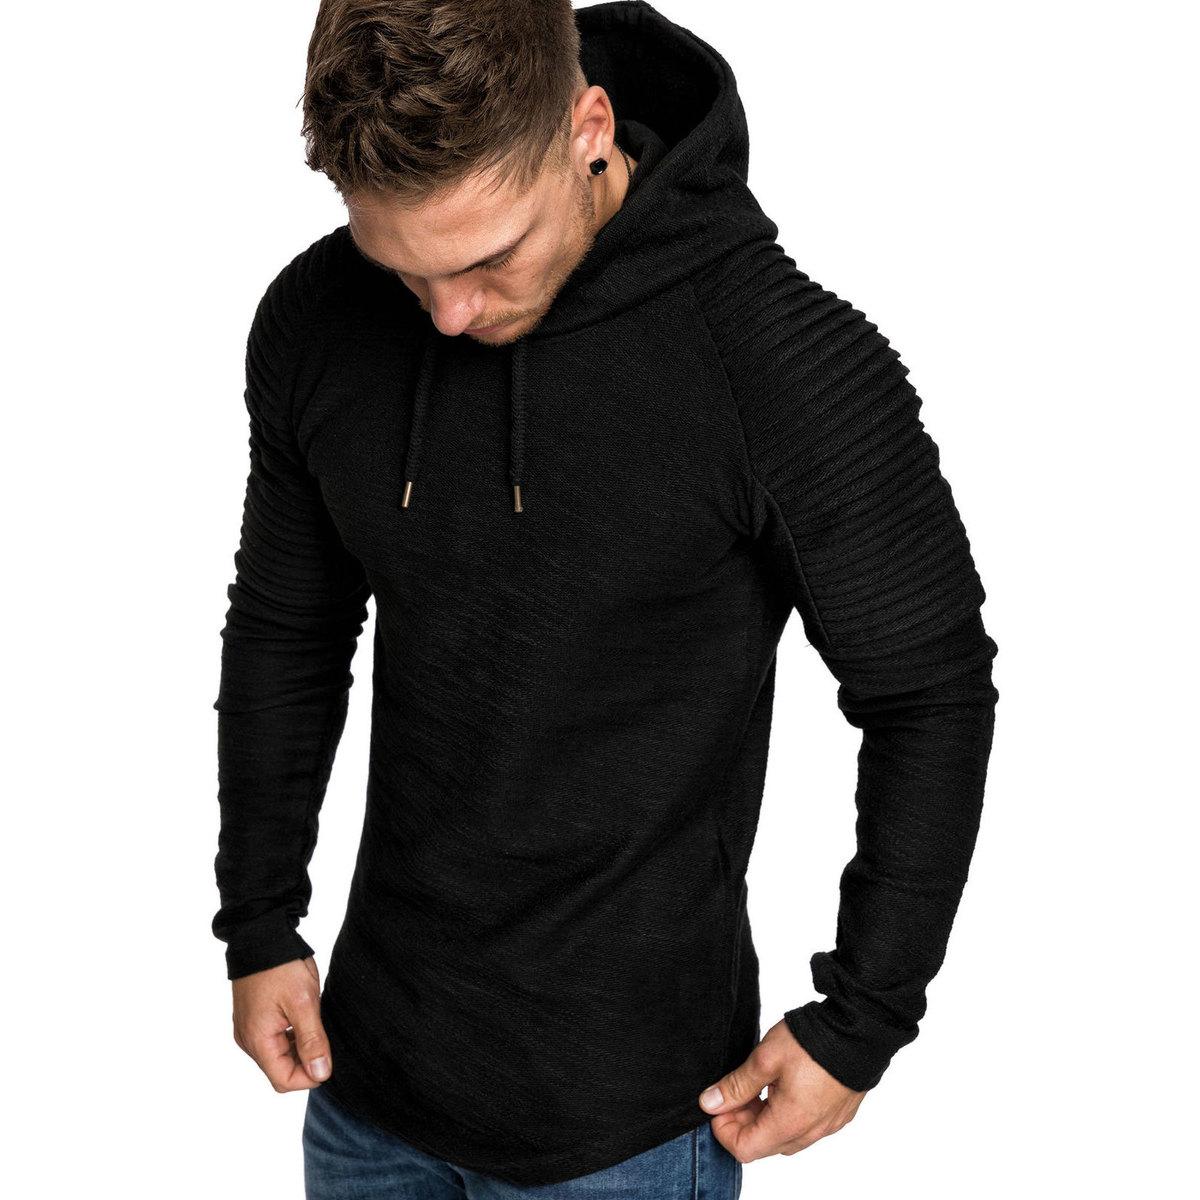 Moomphya Ragan sleeve hooded men t shirt Pleated sleeve t-shirt men Longline curved hem Hip hop slim tshirt streetwear tops 4